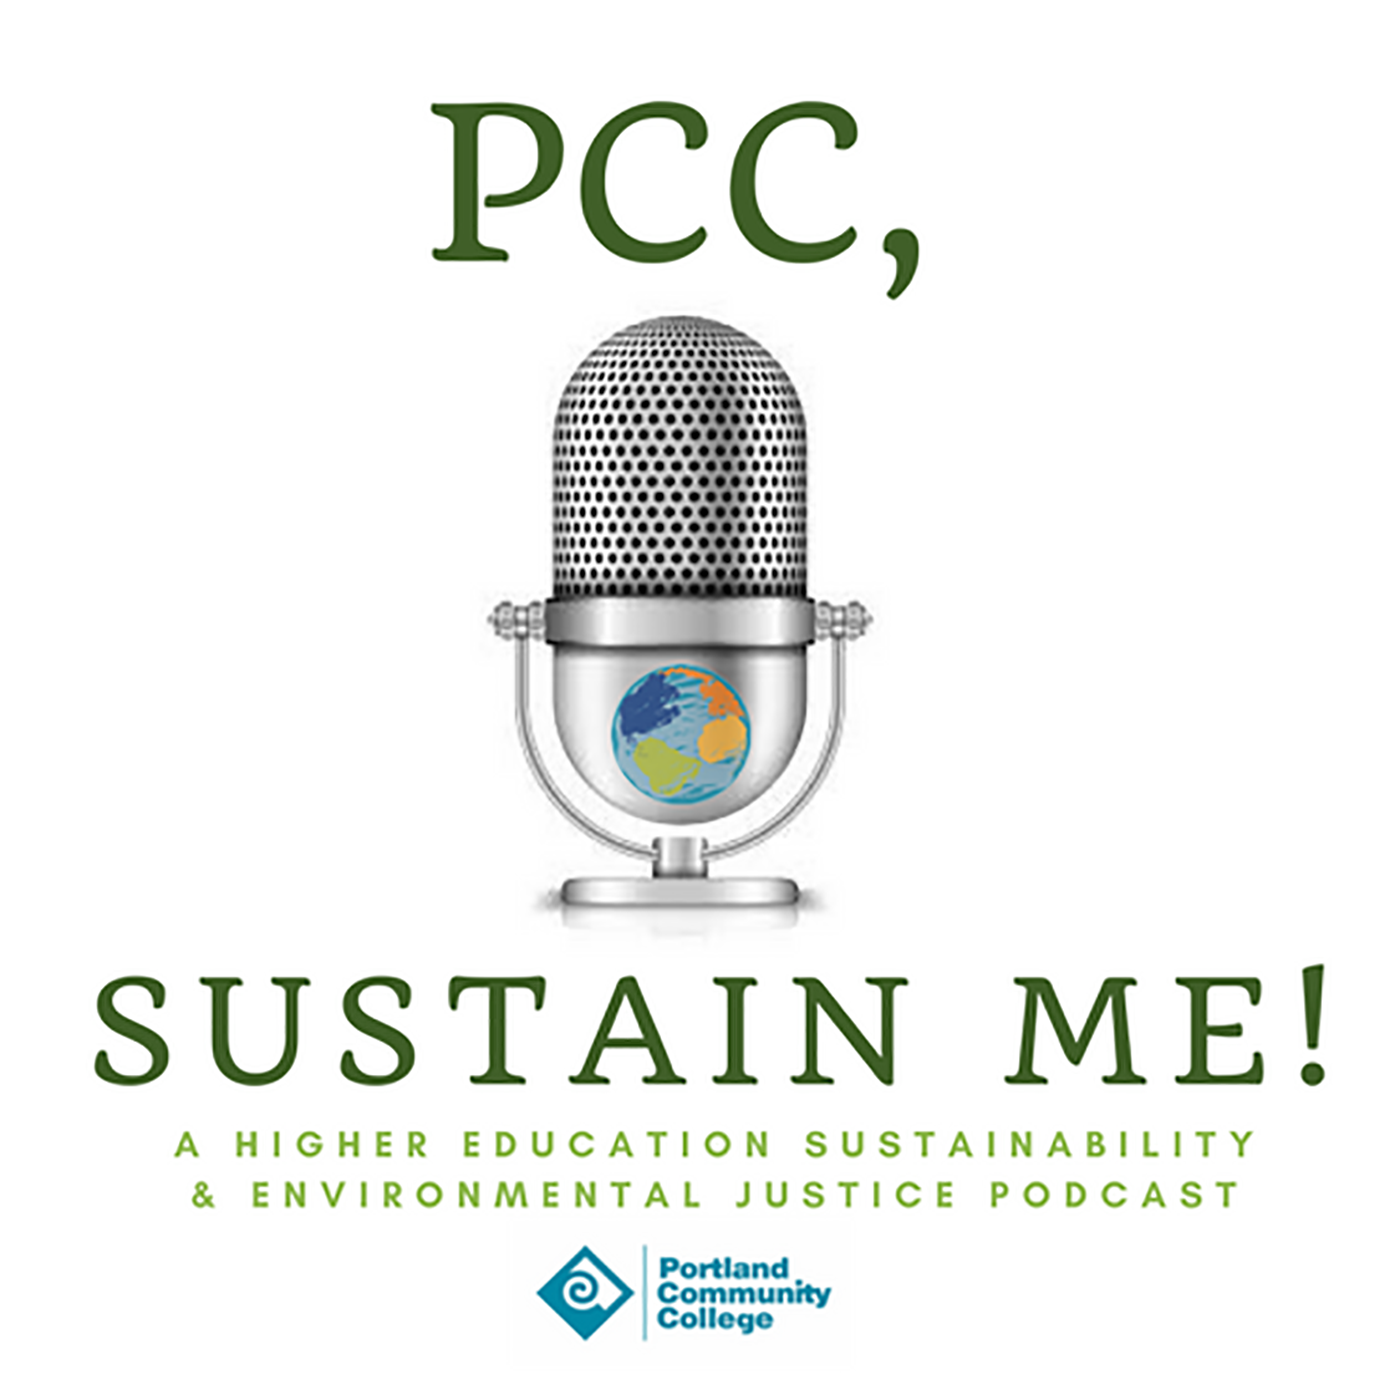 PCC, Sustain Me! ~ Podcast